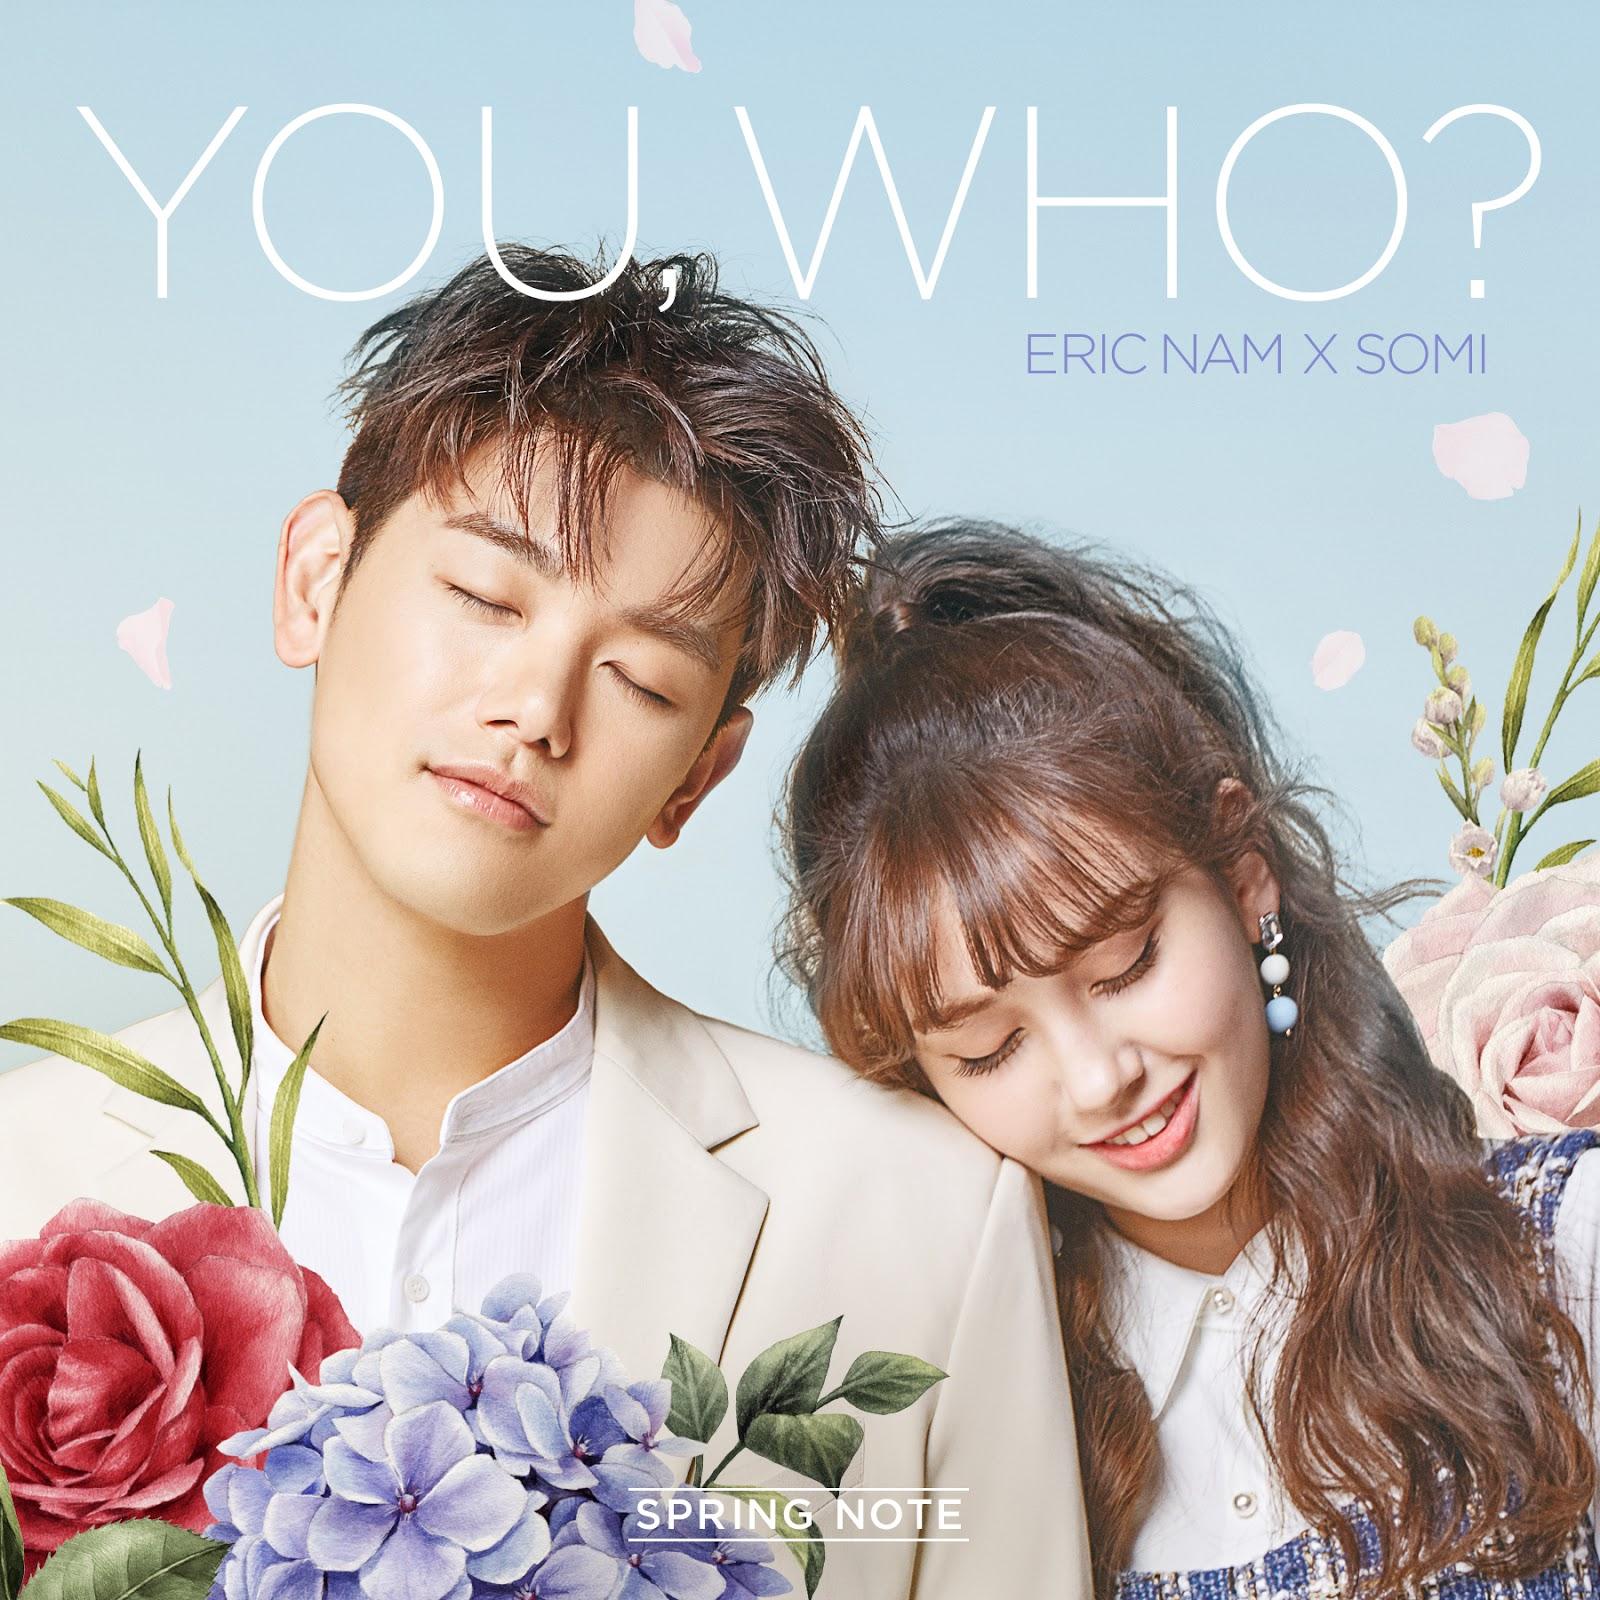 Korean MyuzicStyleZ: Eric Nam X Somi - You, Who? [Easy-Lyrics | ENG]